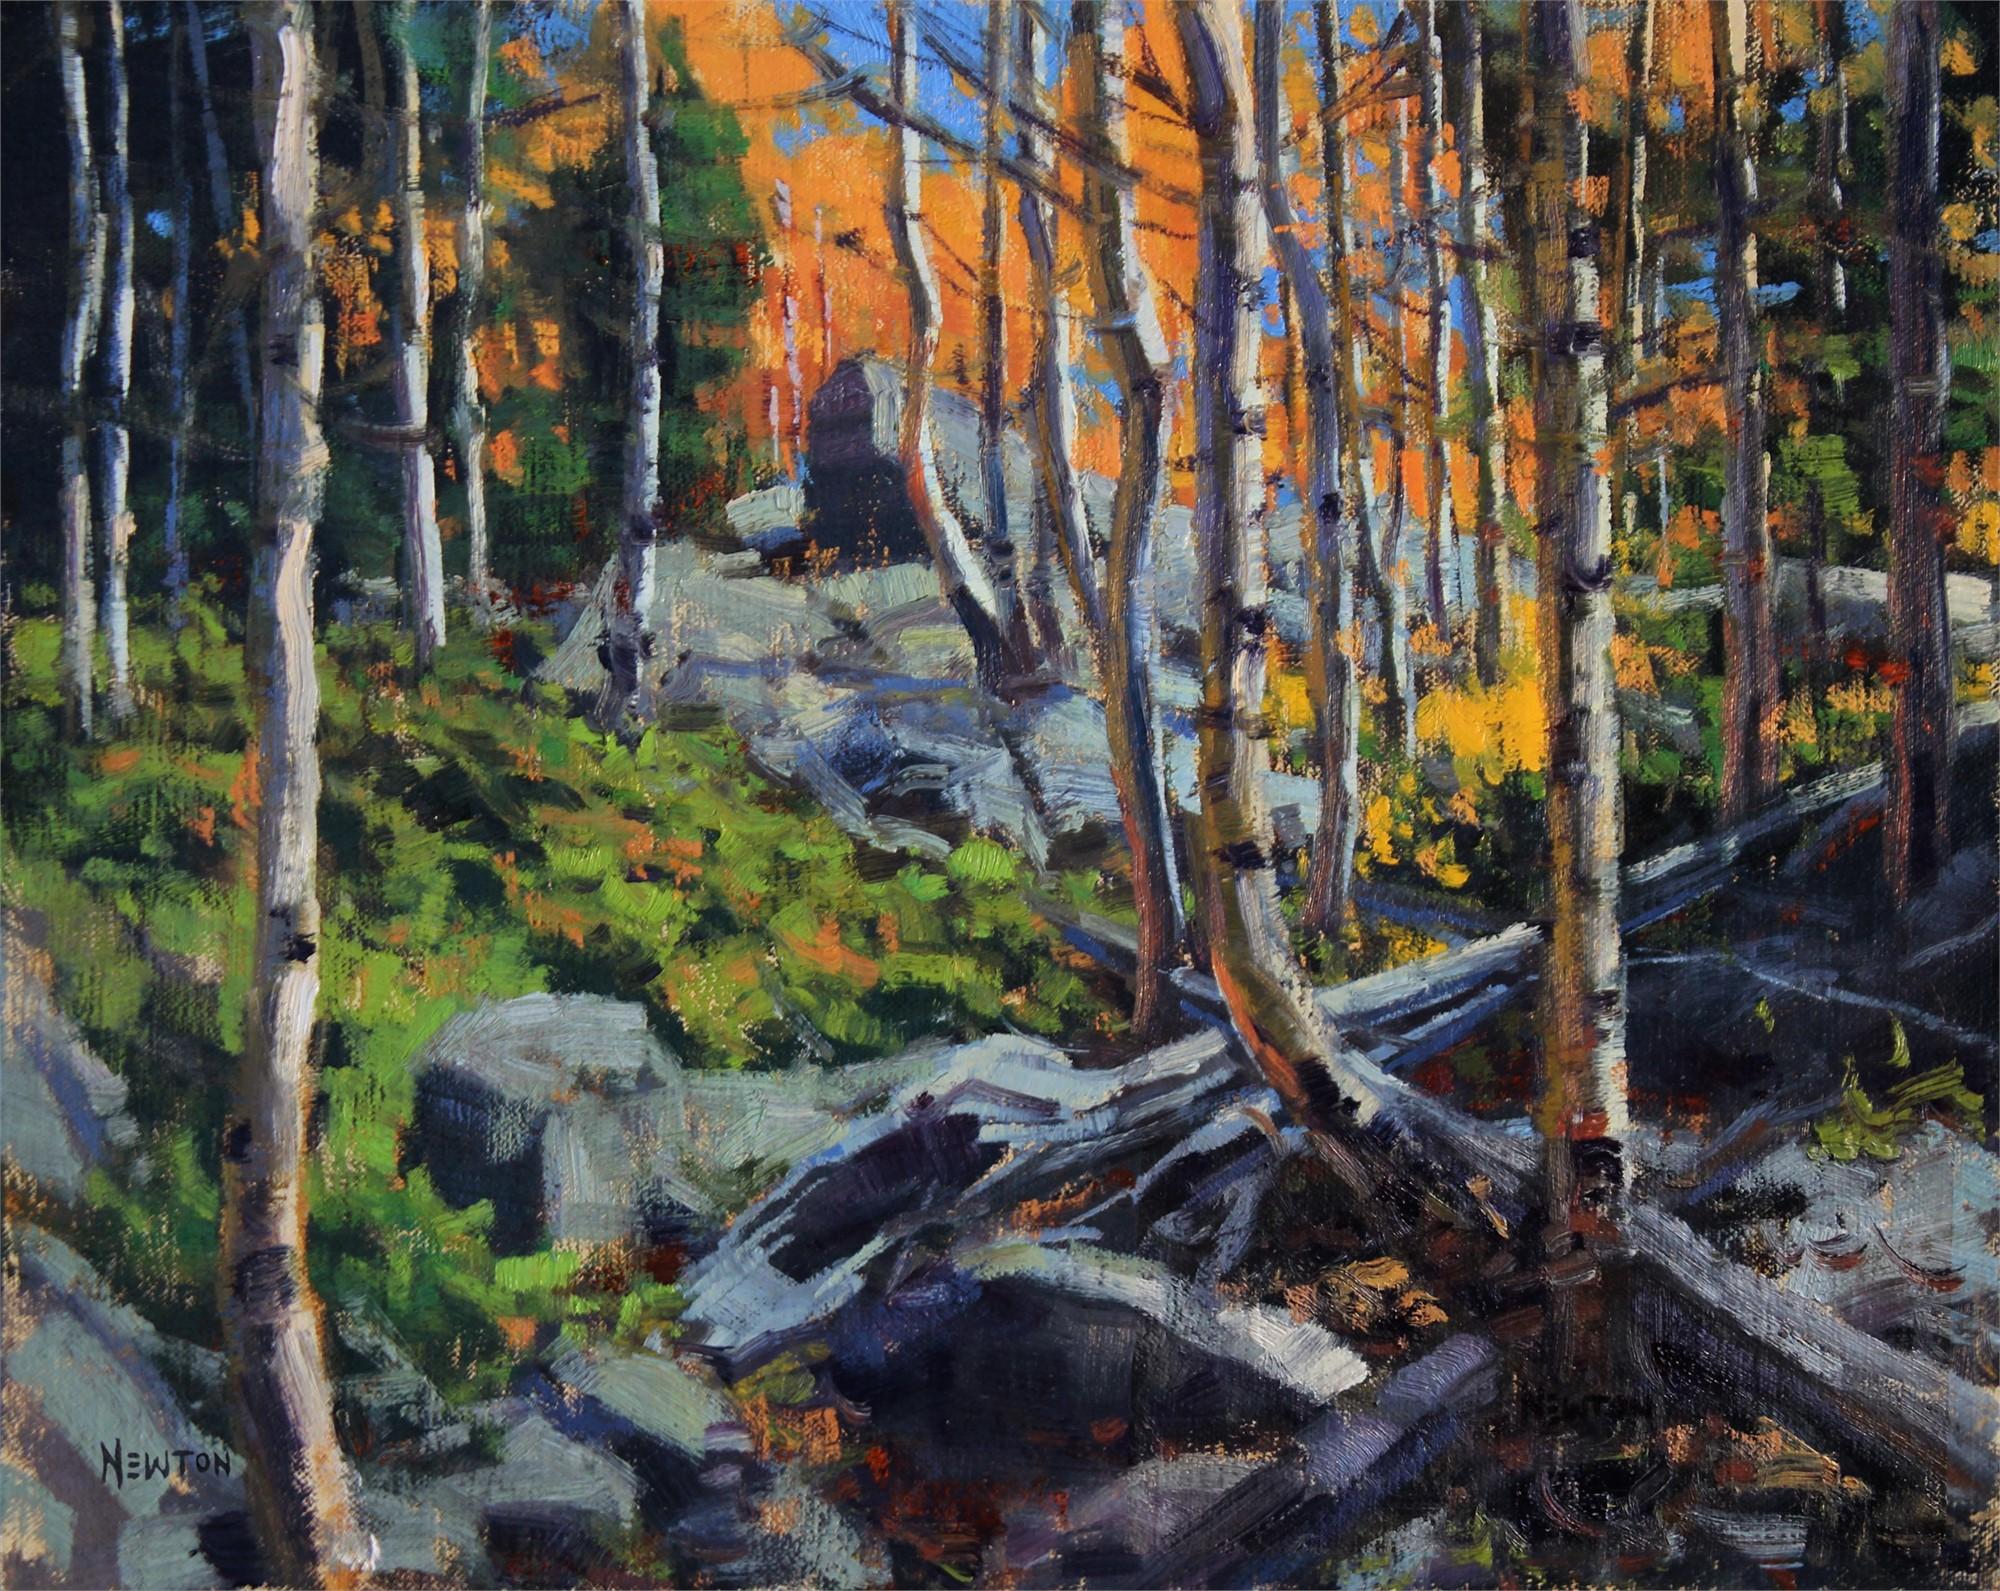 Aspen Standoff Study by Wes Newton